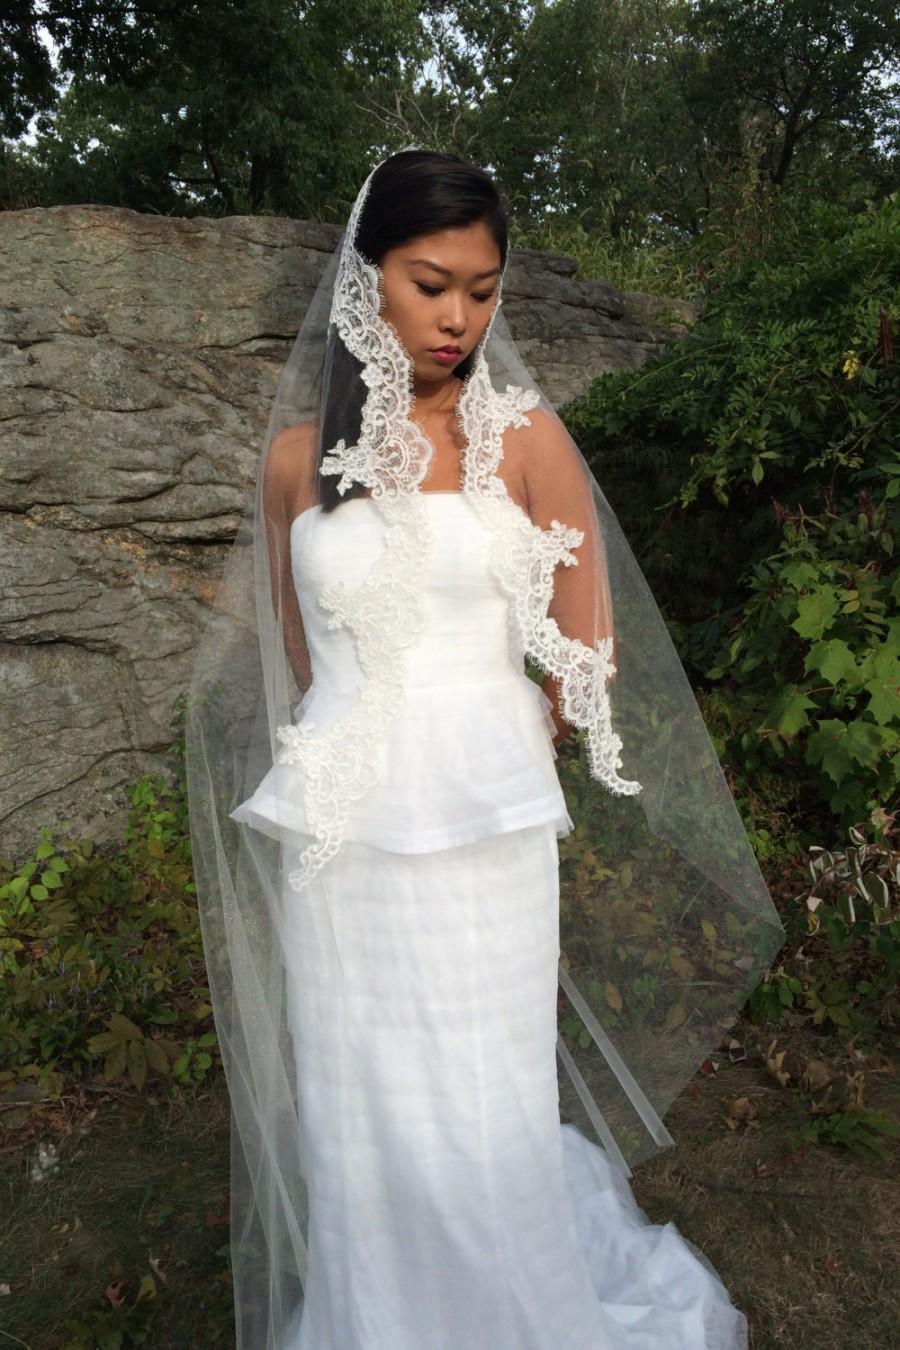 Hochzeit - Mantilla Veil, Lace Wedding Veil, Wedding Accessories, Veils, Alencon Lace Bridal Veil, Style No. 1553